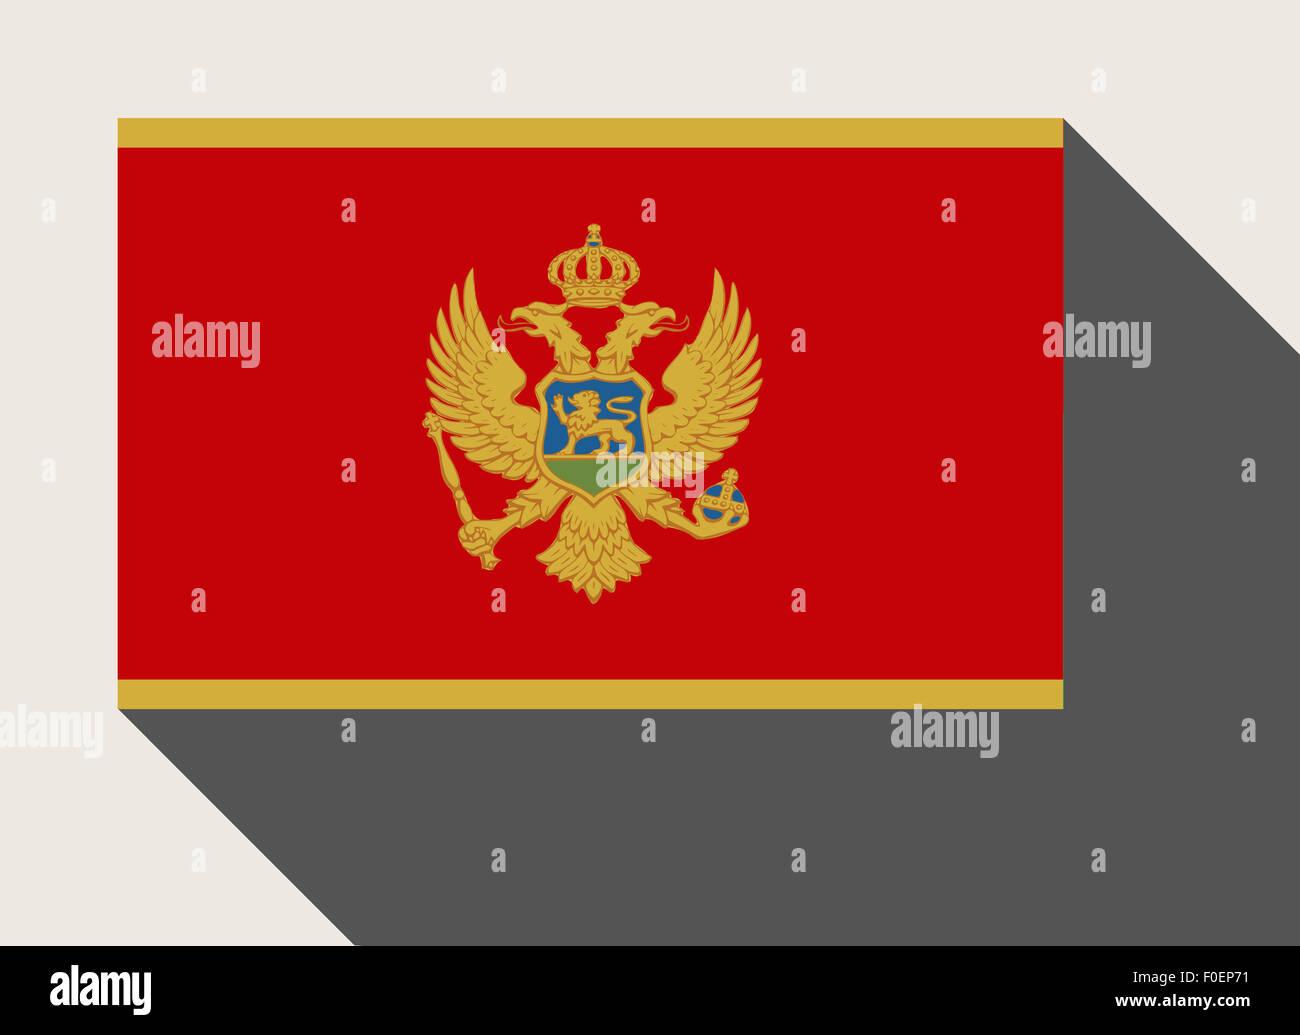 Montenegro flag in flat web design style. Stock Photo